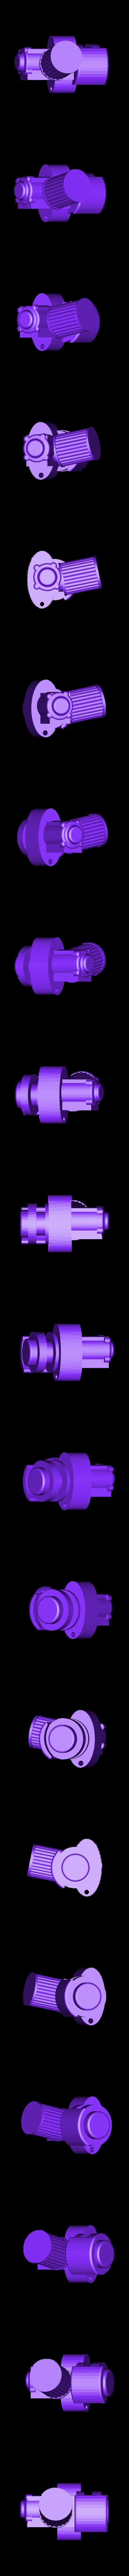 luchtfilter.stl Download free STL file trick (custom) • 3D printer model, jasperbaudoin